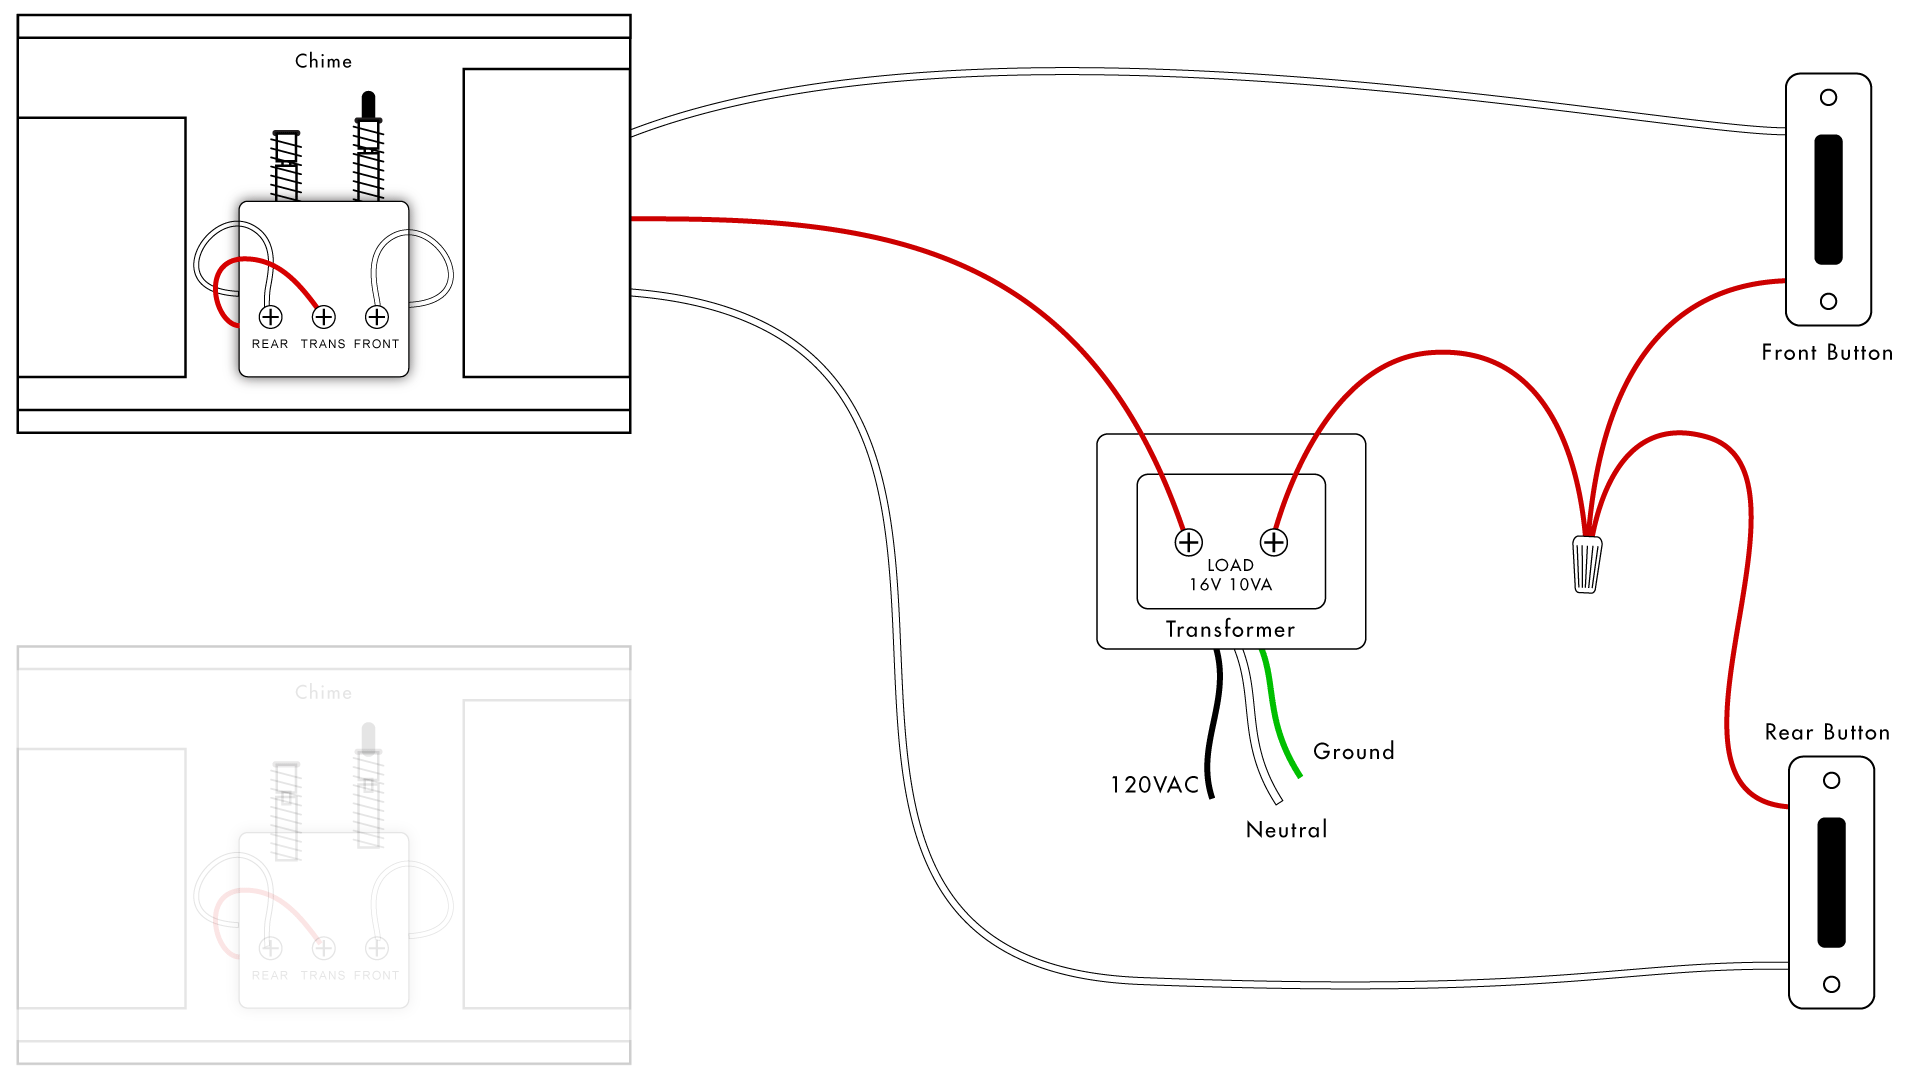 medium resolution of new wiring diagram for bt master socket diagrams digramssample diagramimages wiringdiagramsample wiringdiagram